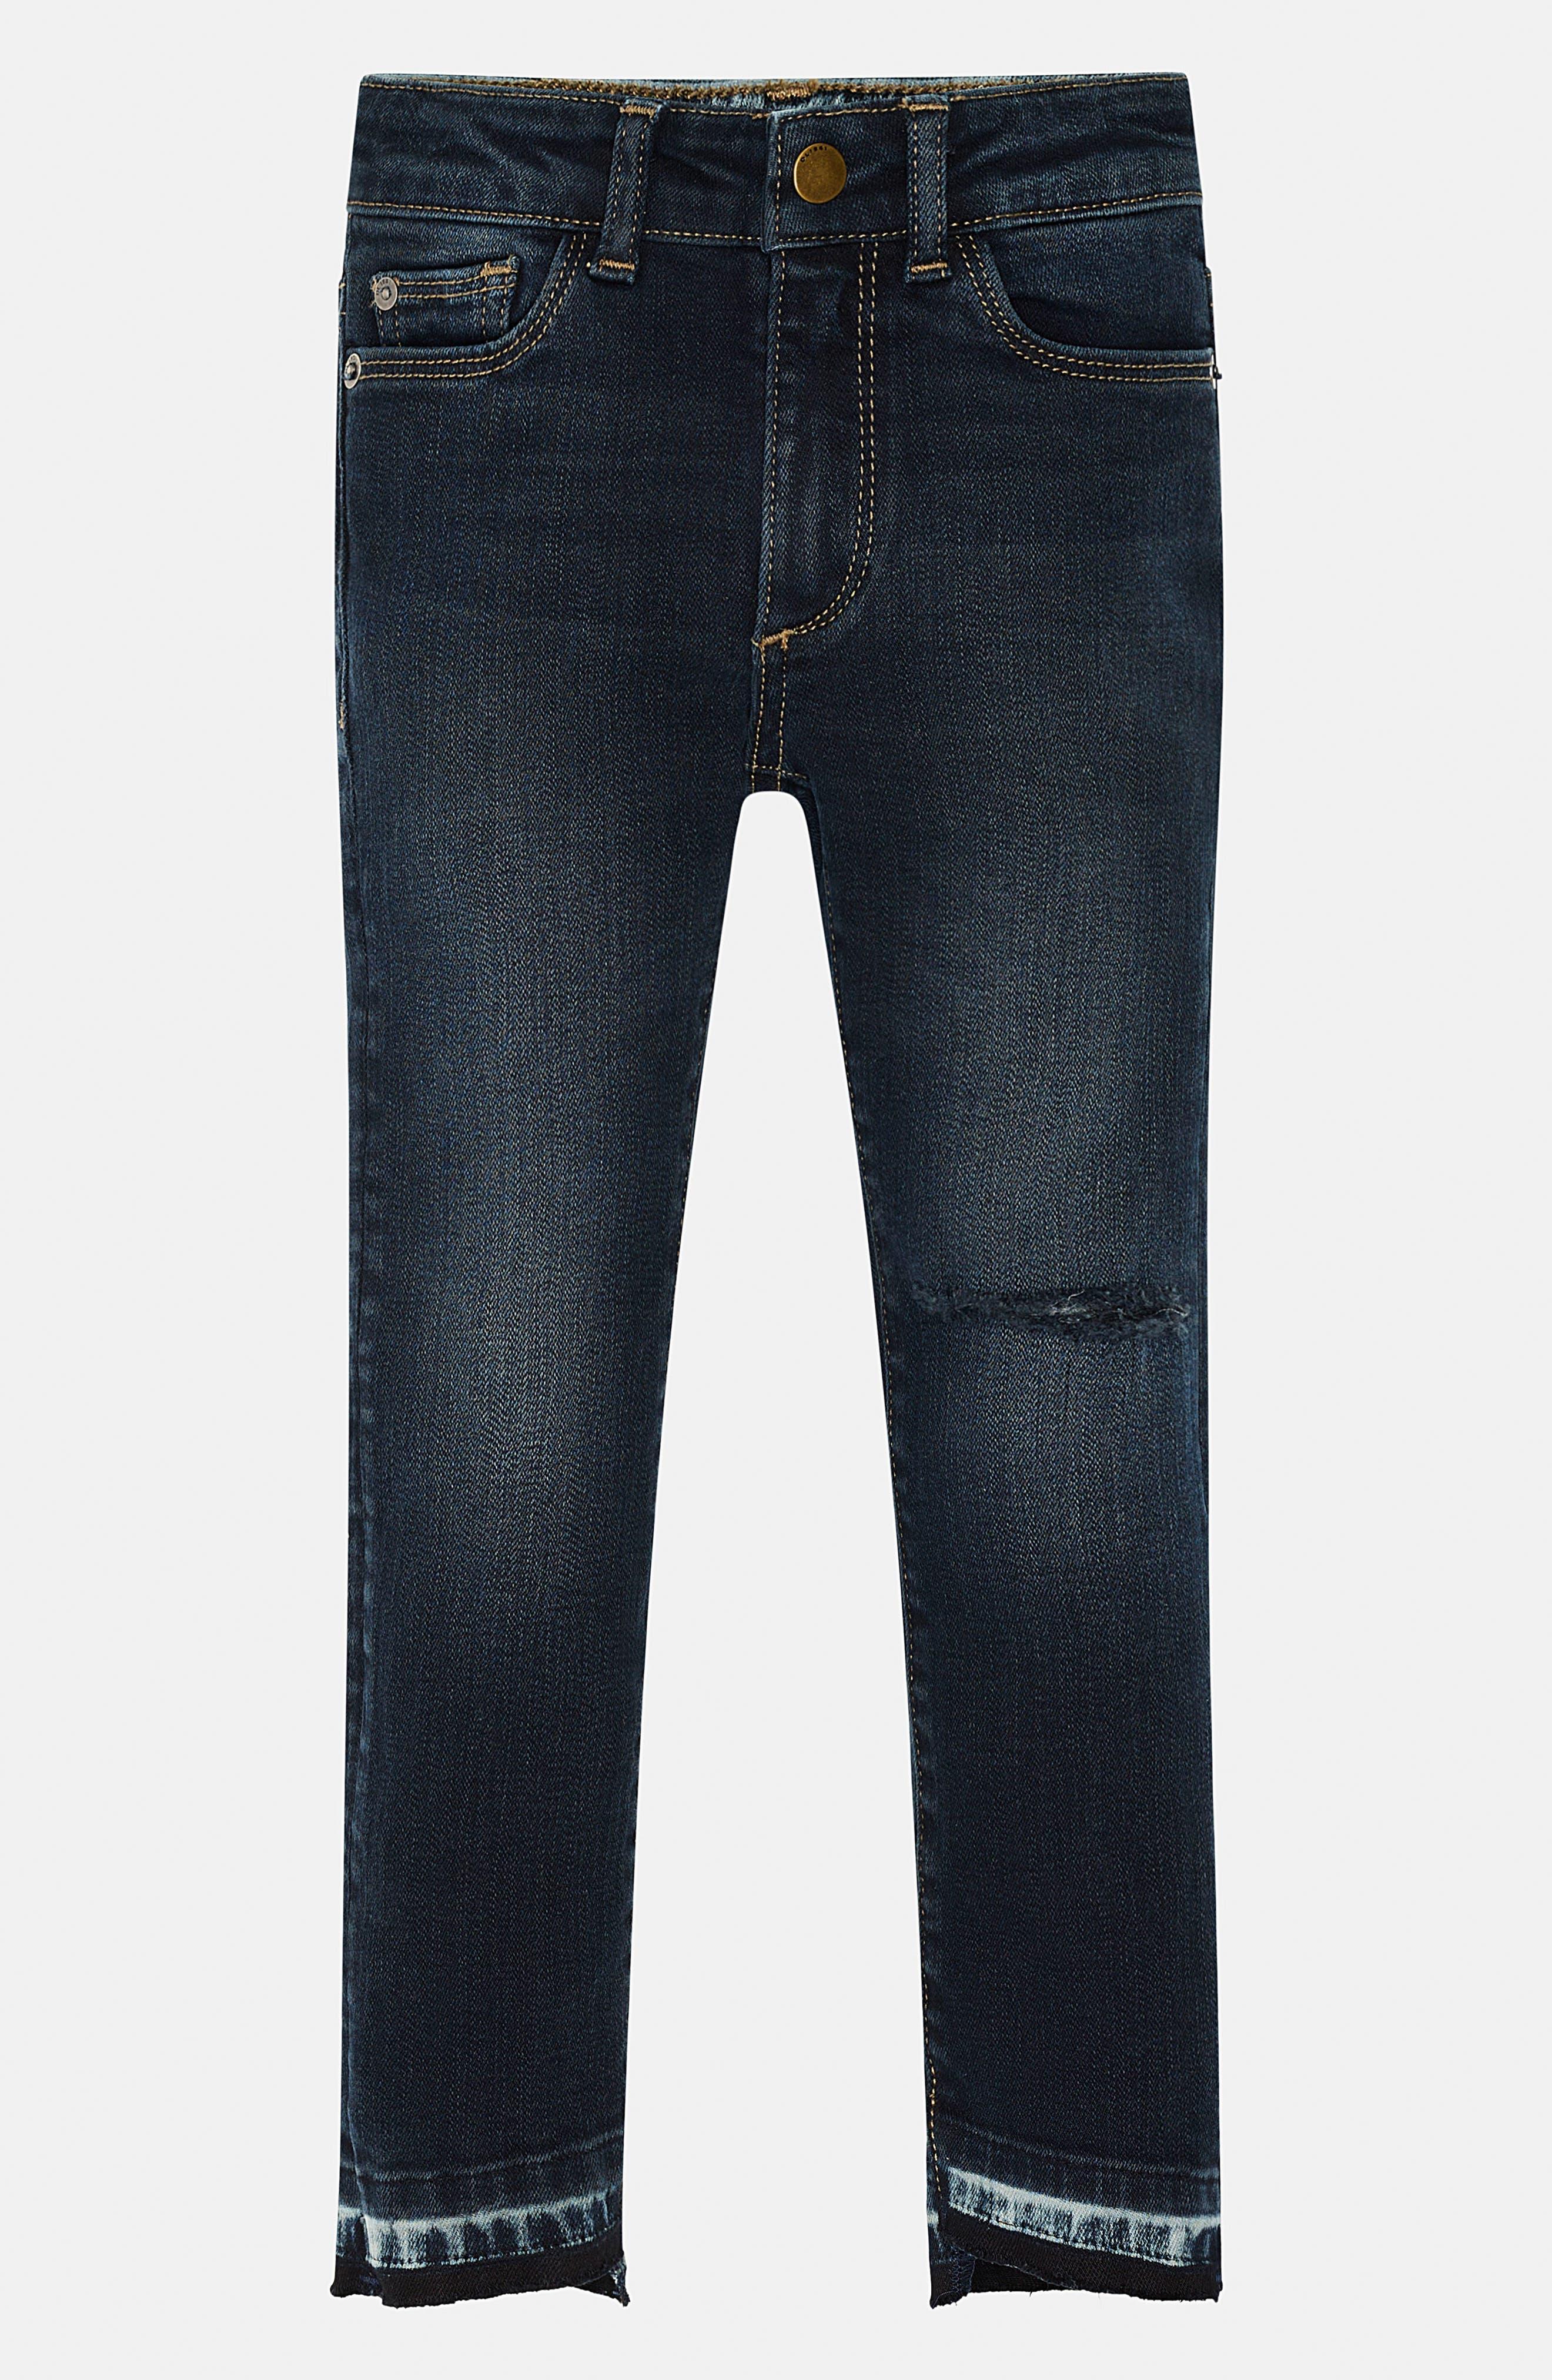 Chloe Distressed Skinny Jeans,                             Main thumbnail 1, color,                             401